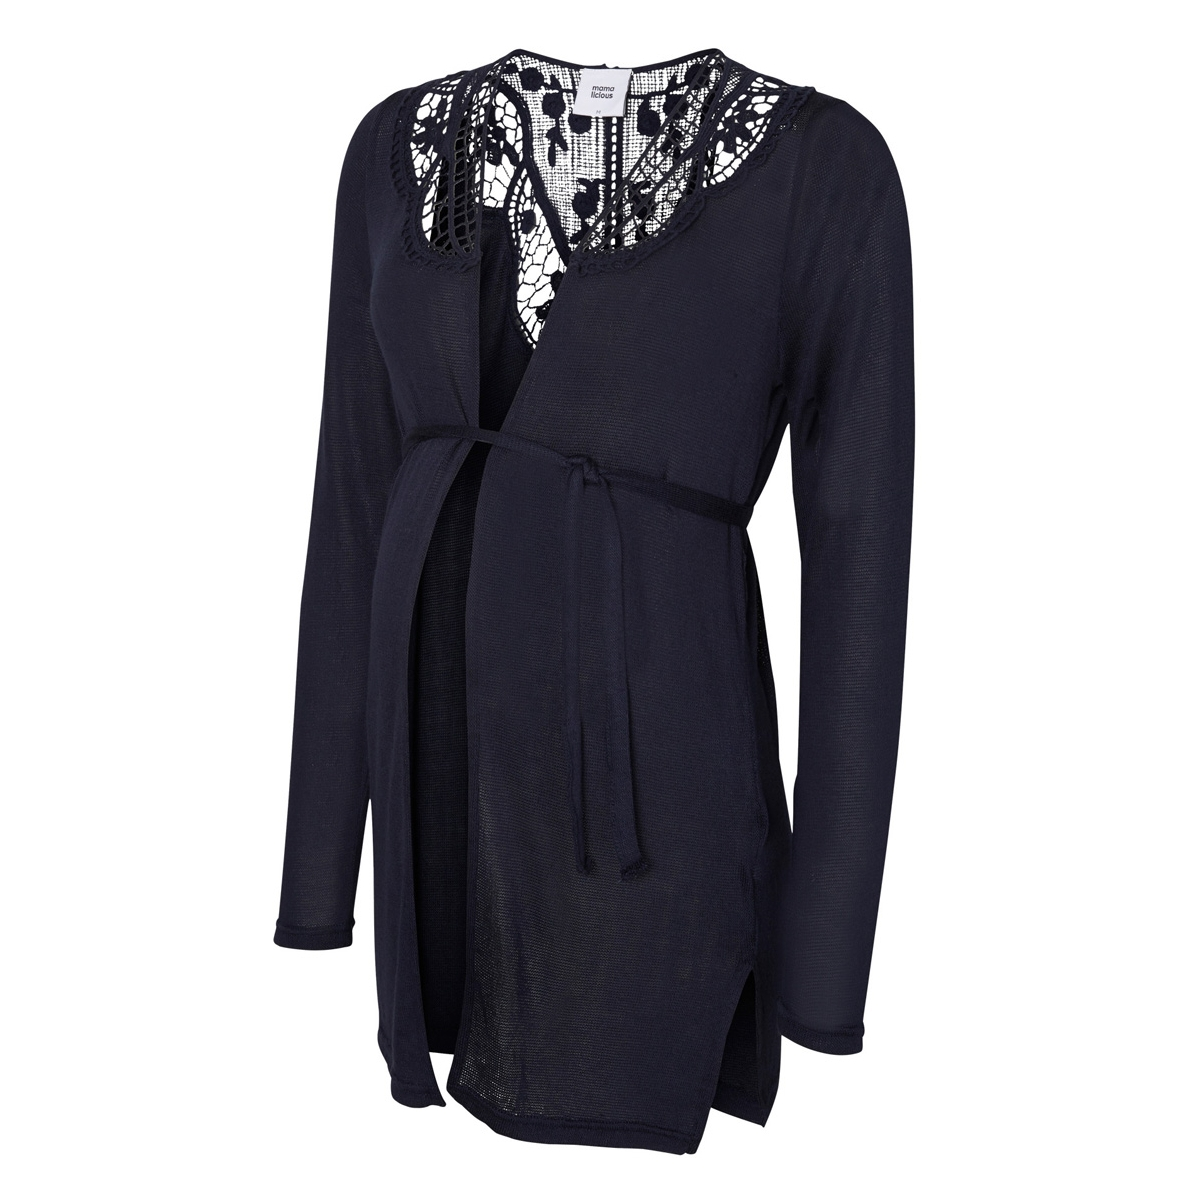 mlcardi l/s jersey cardigan 20006523 mama-licious positie vest navy blazer